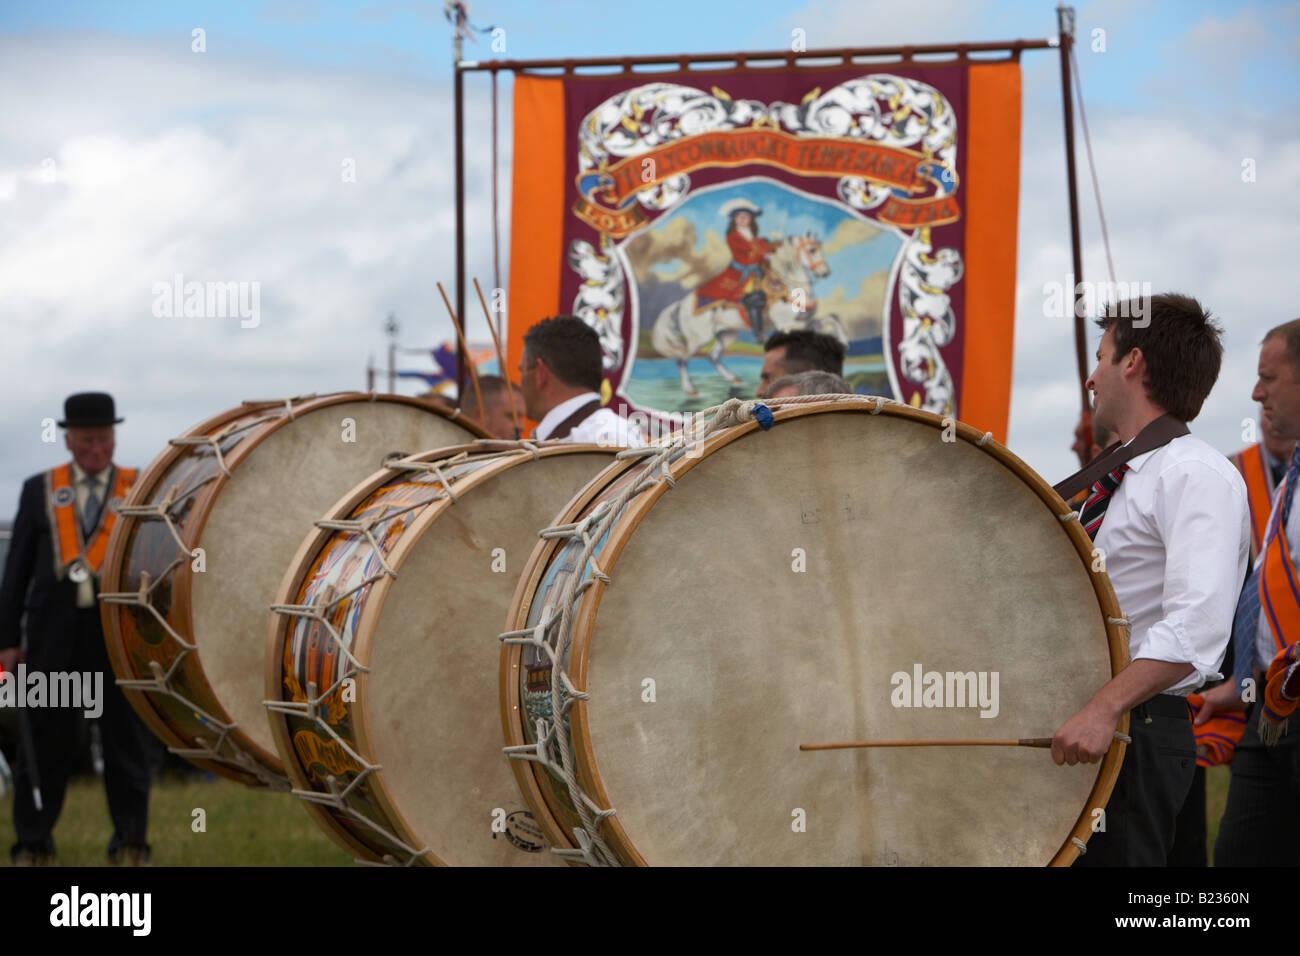 b410 drum reset instructions